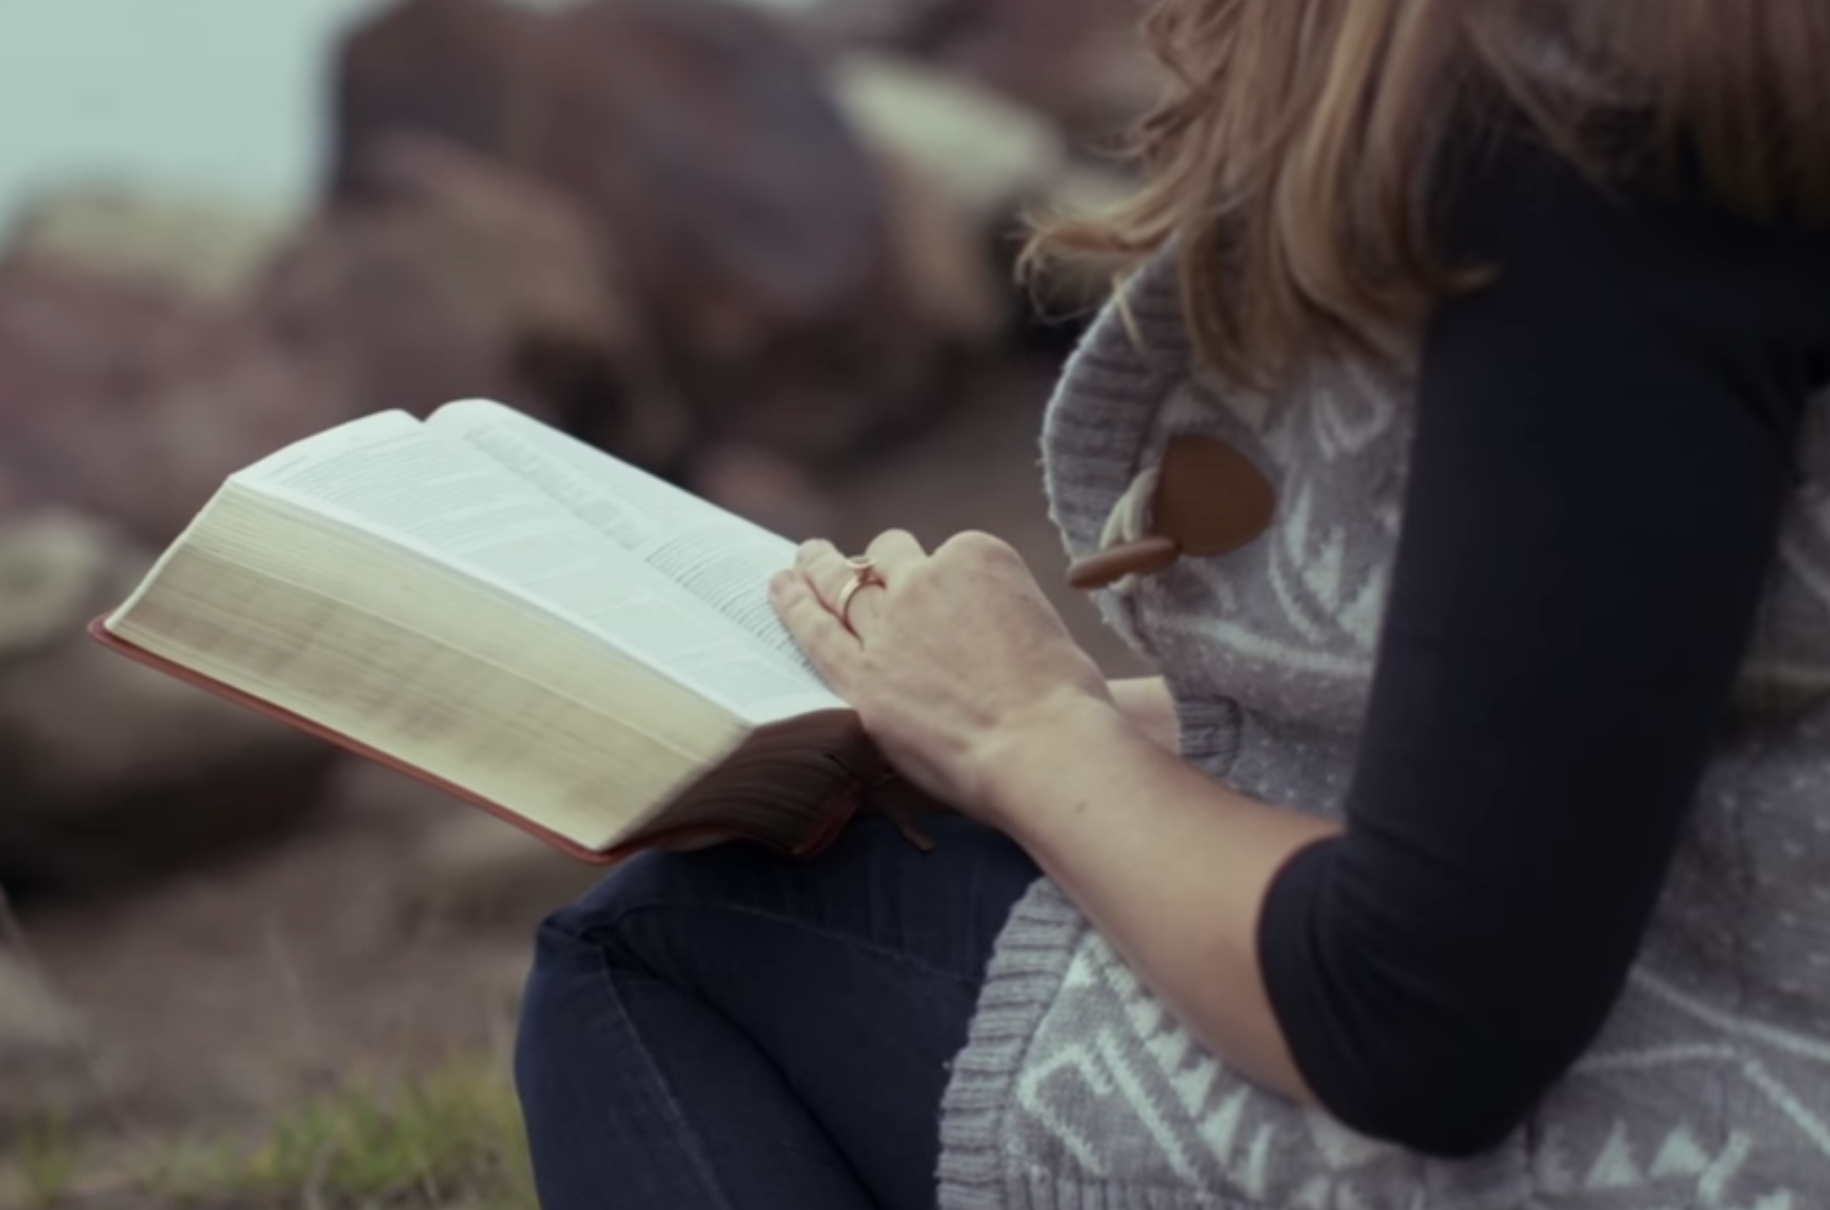 Download the Read Scripture app here